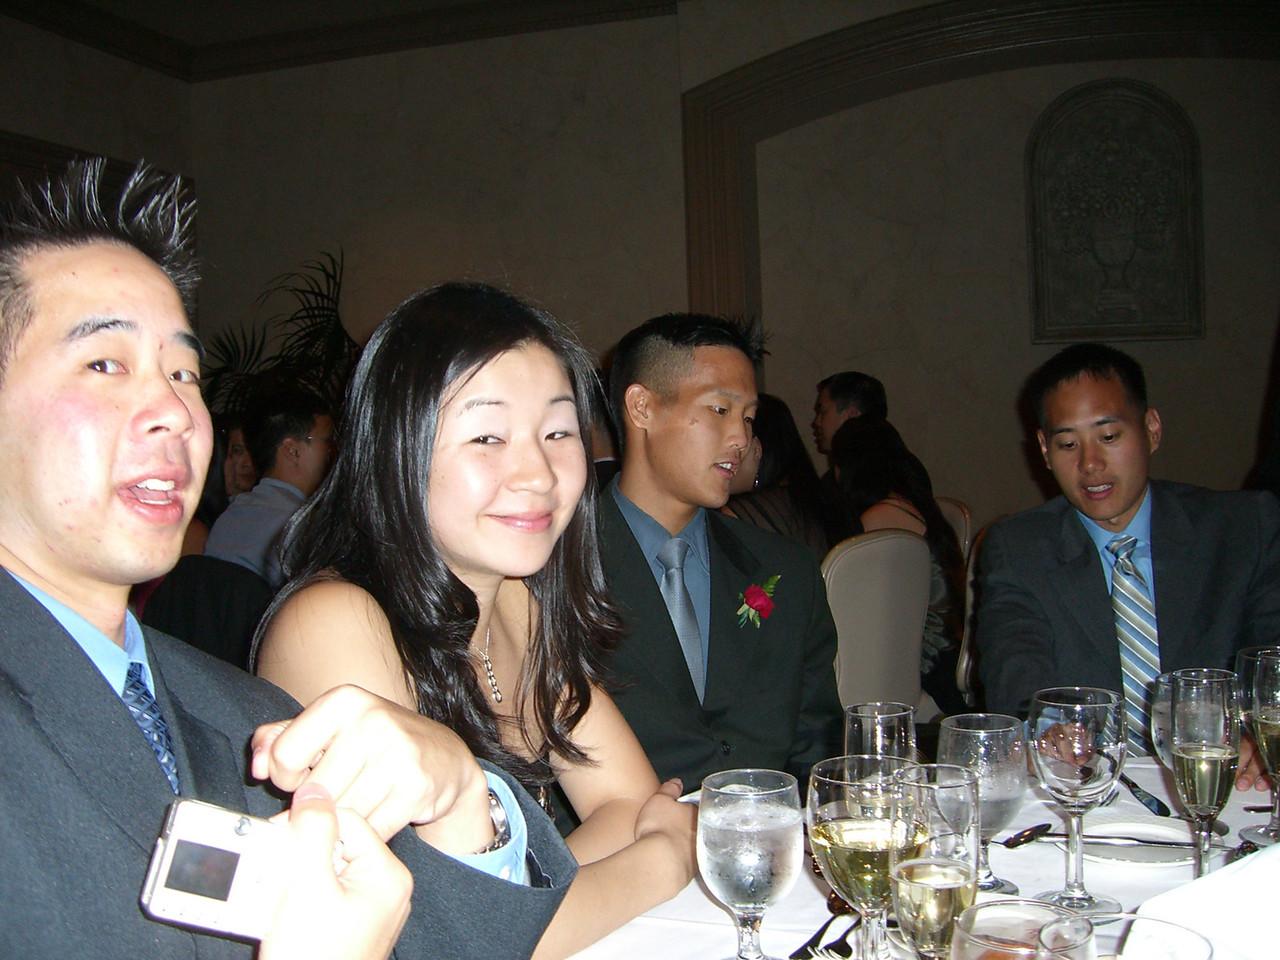 Henry 'Cheeks' Peng, Cathy & Kuangshin Tai, and Jimmy Chen